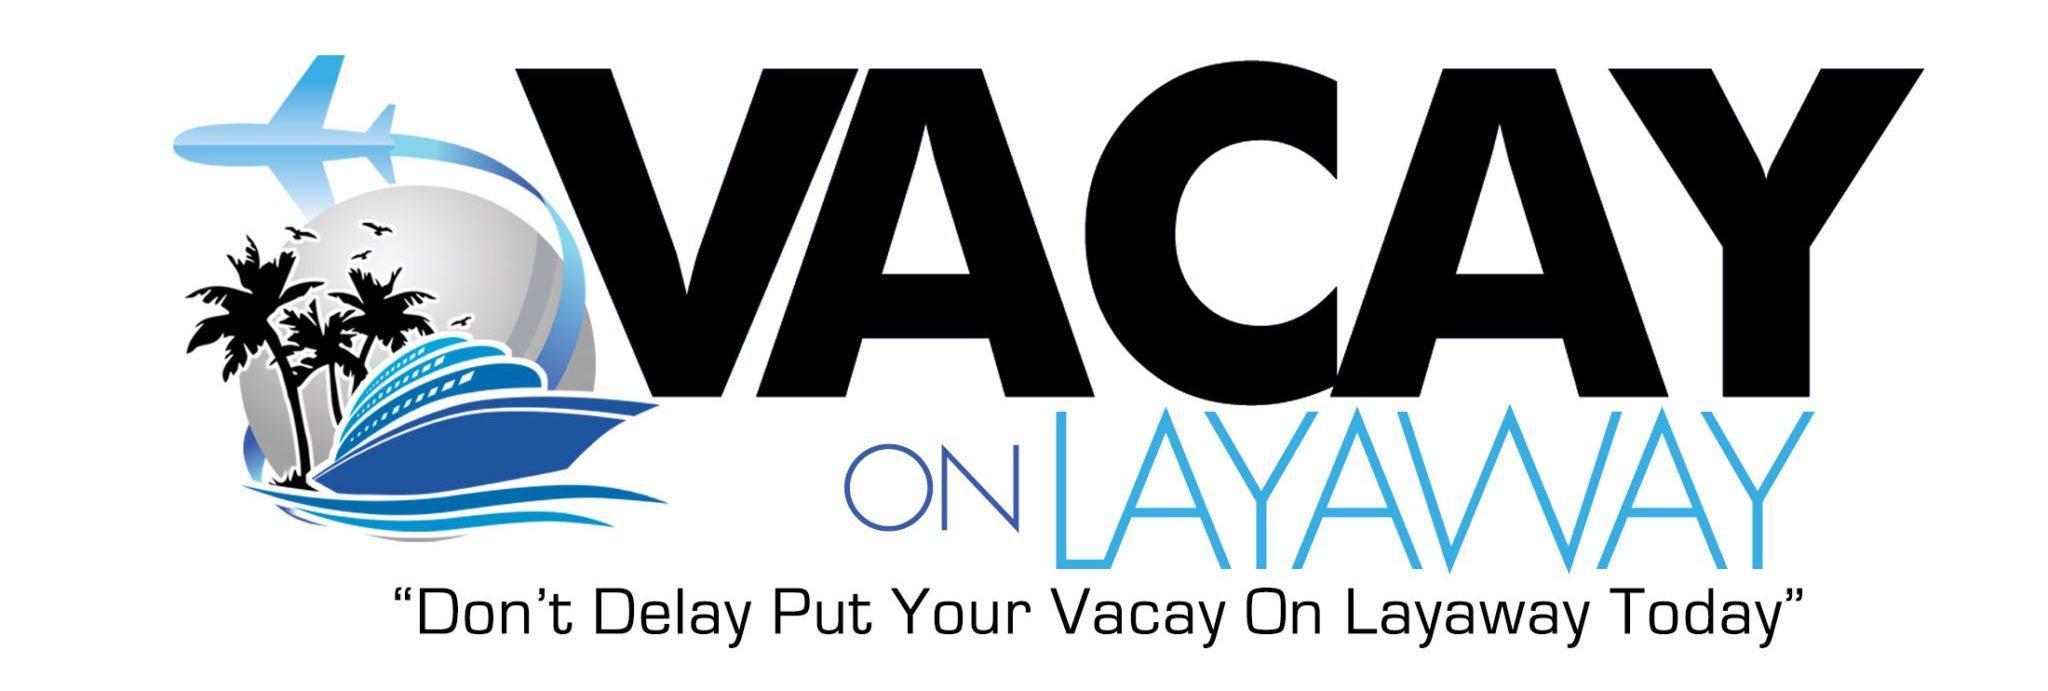 Vacay On Layaway